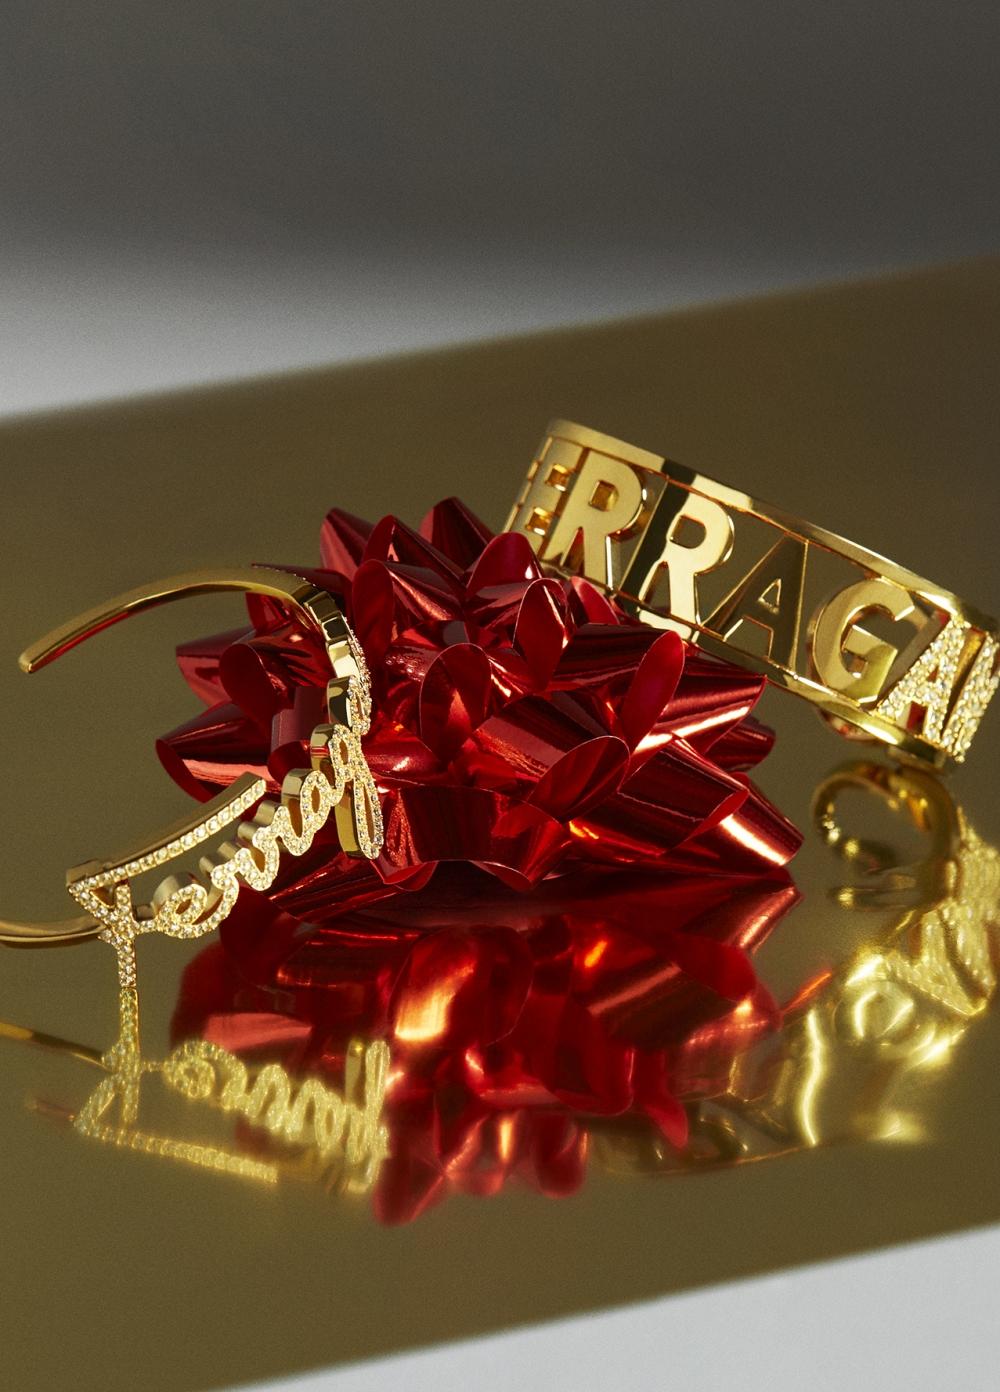 FENDI、Miu Miu、PRADA等全新假日系列,為聖誕禮物給一點靈感!00010006